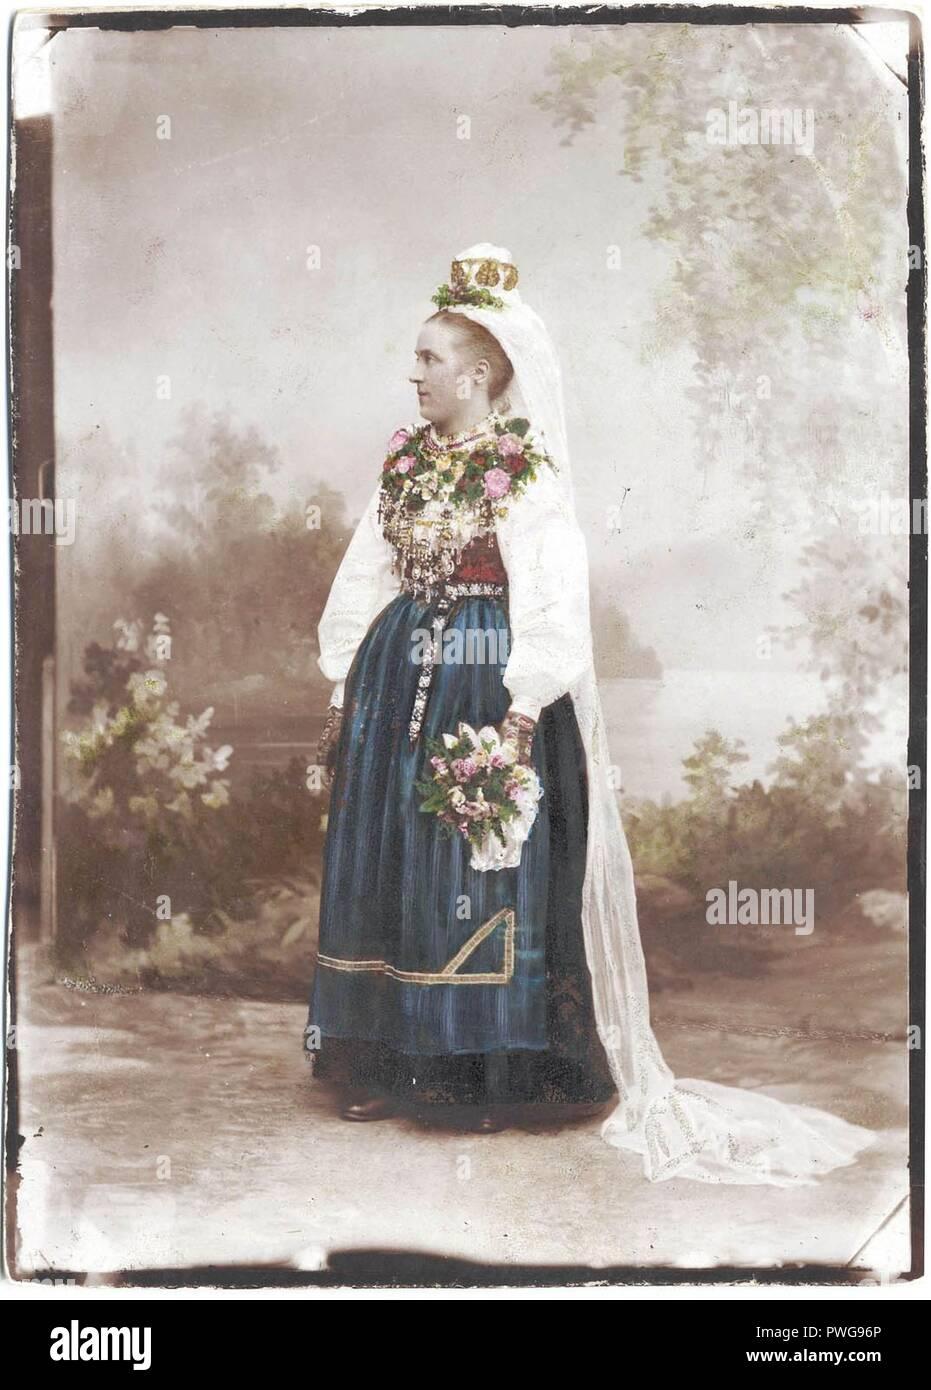 Bröllop, Leksand, Dalarna. Brud i Leksandsdräkt - Nordiska Museet - NMA.0043080. - Stock Image